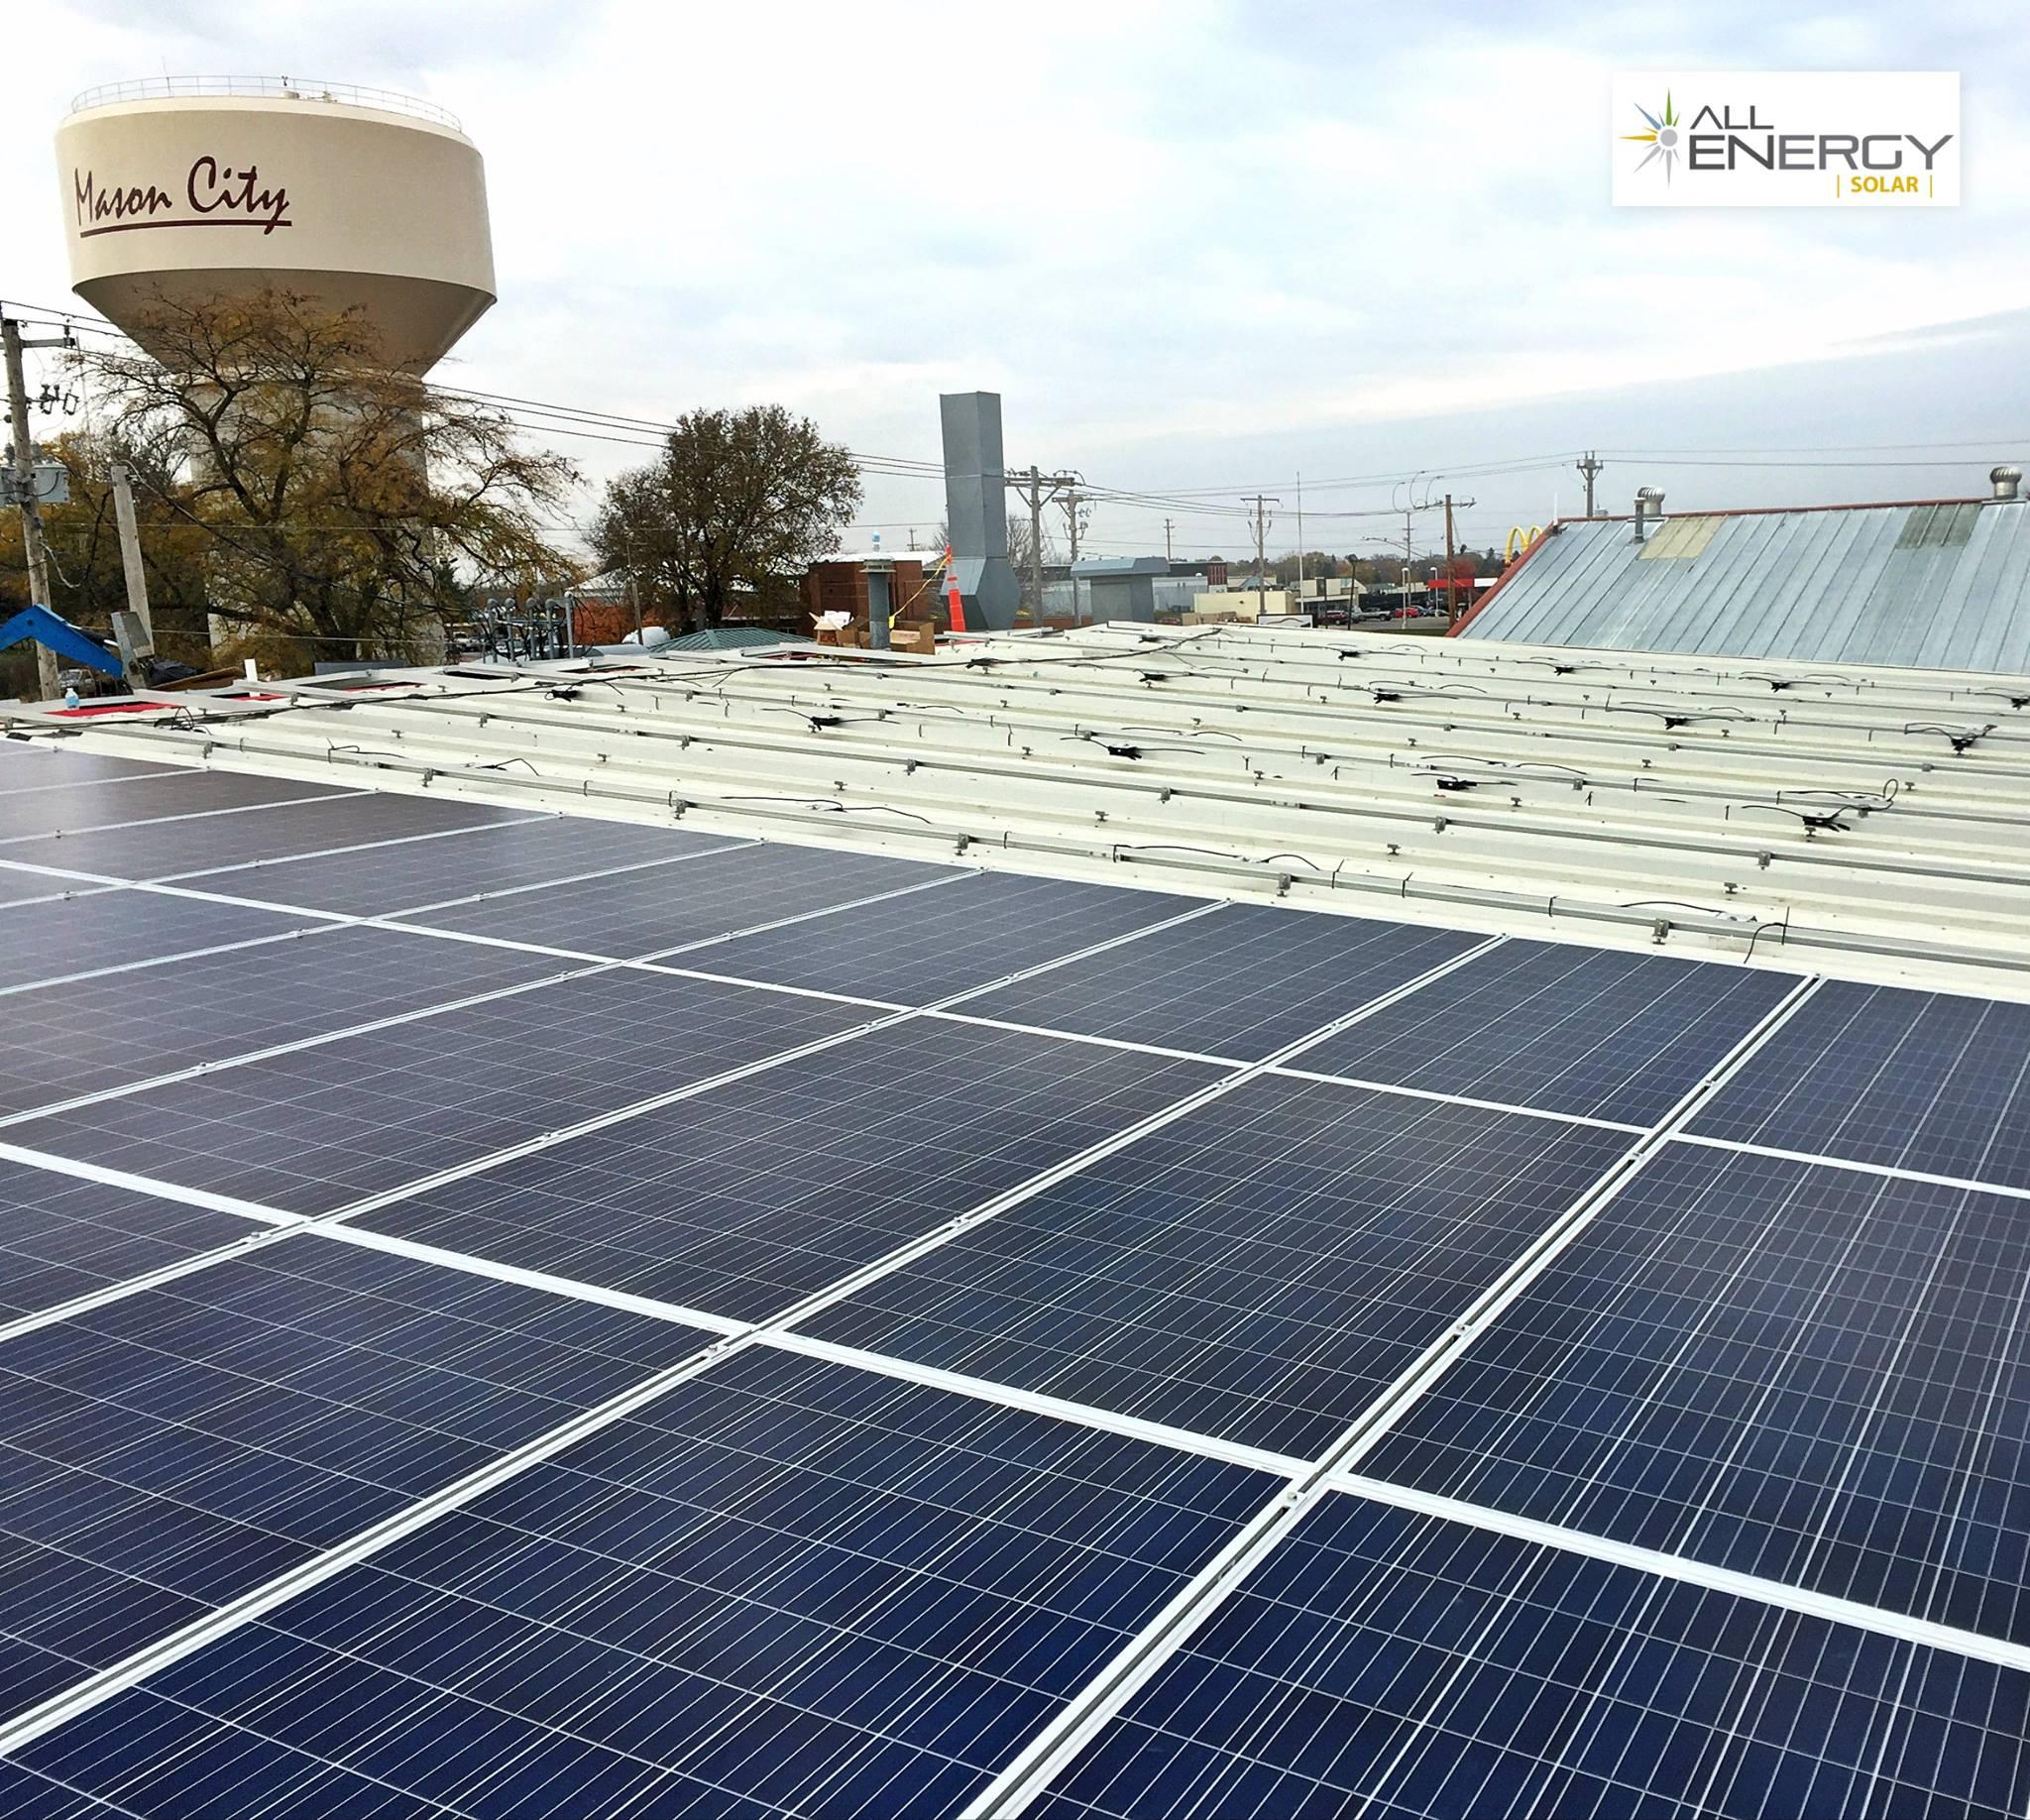 Mason City Iowa Solar Power Installation - All Energy Solar